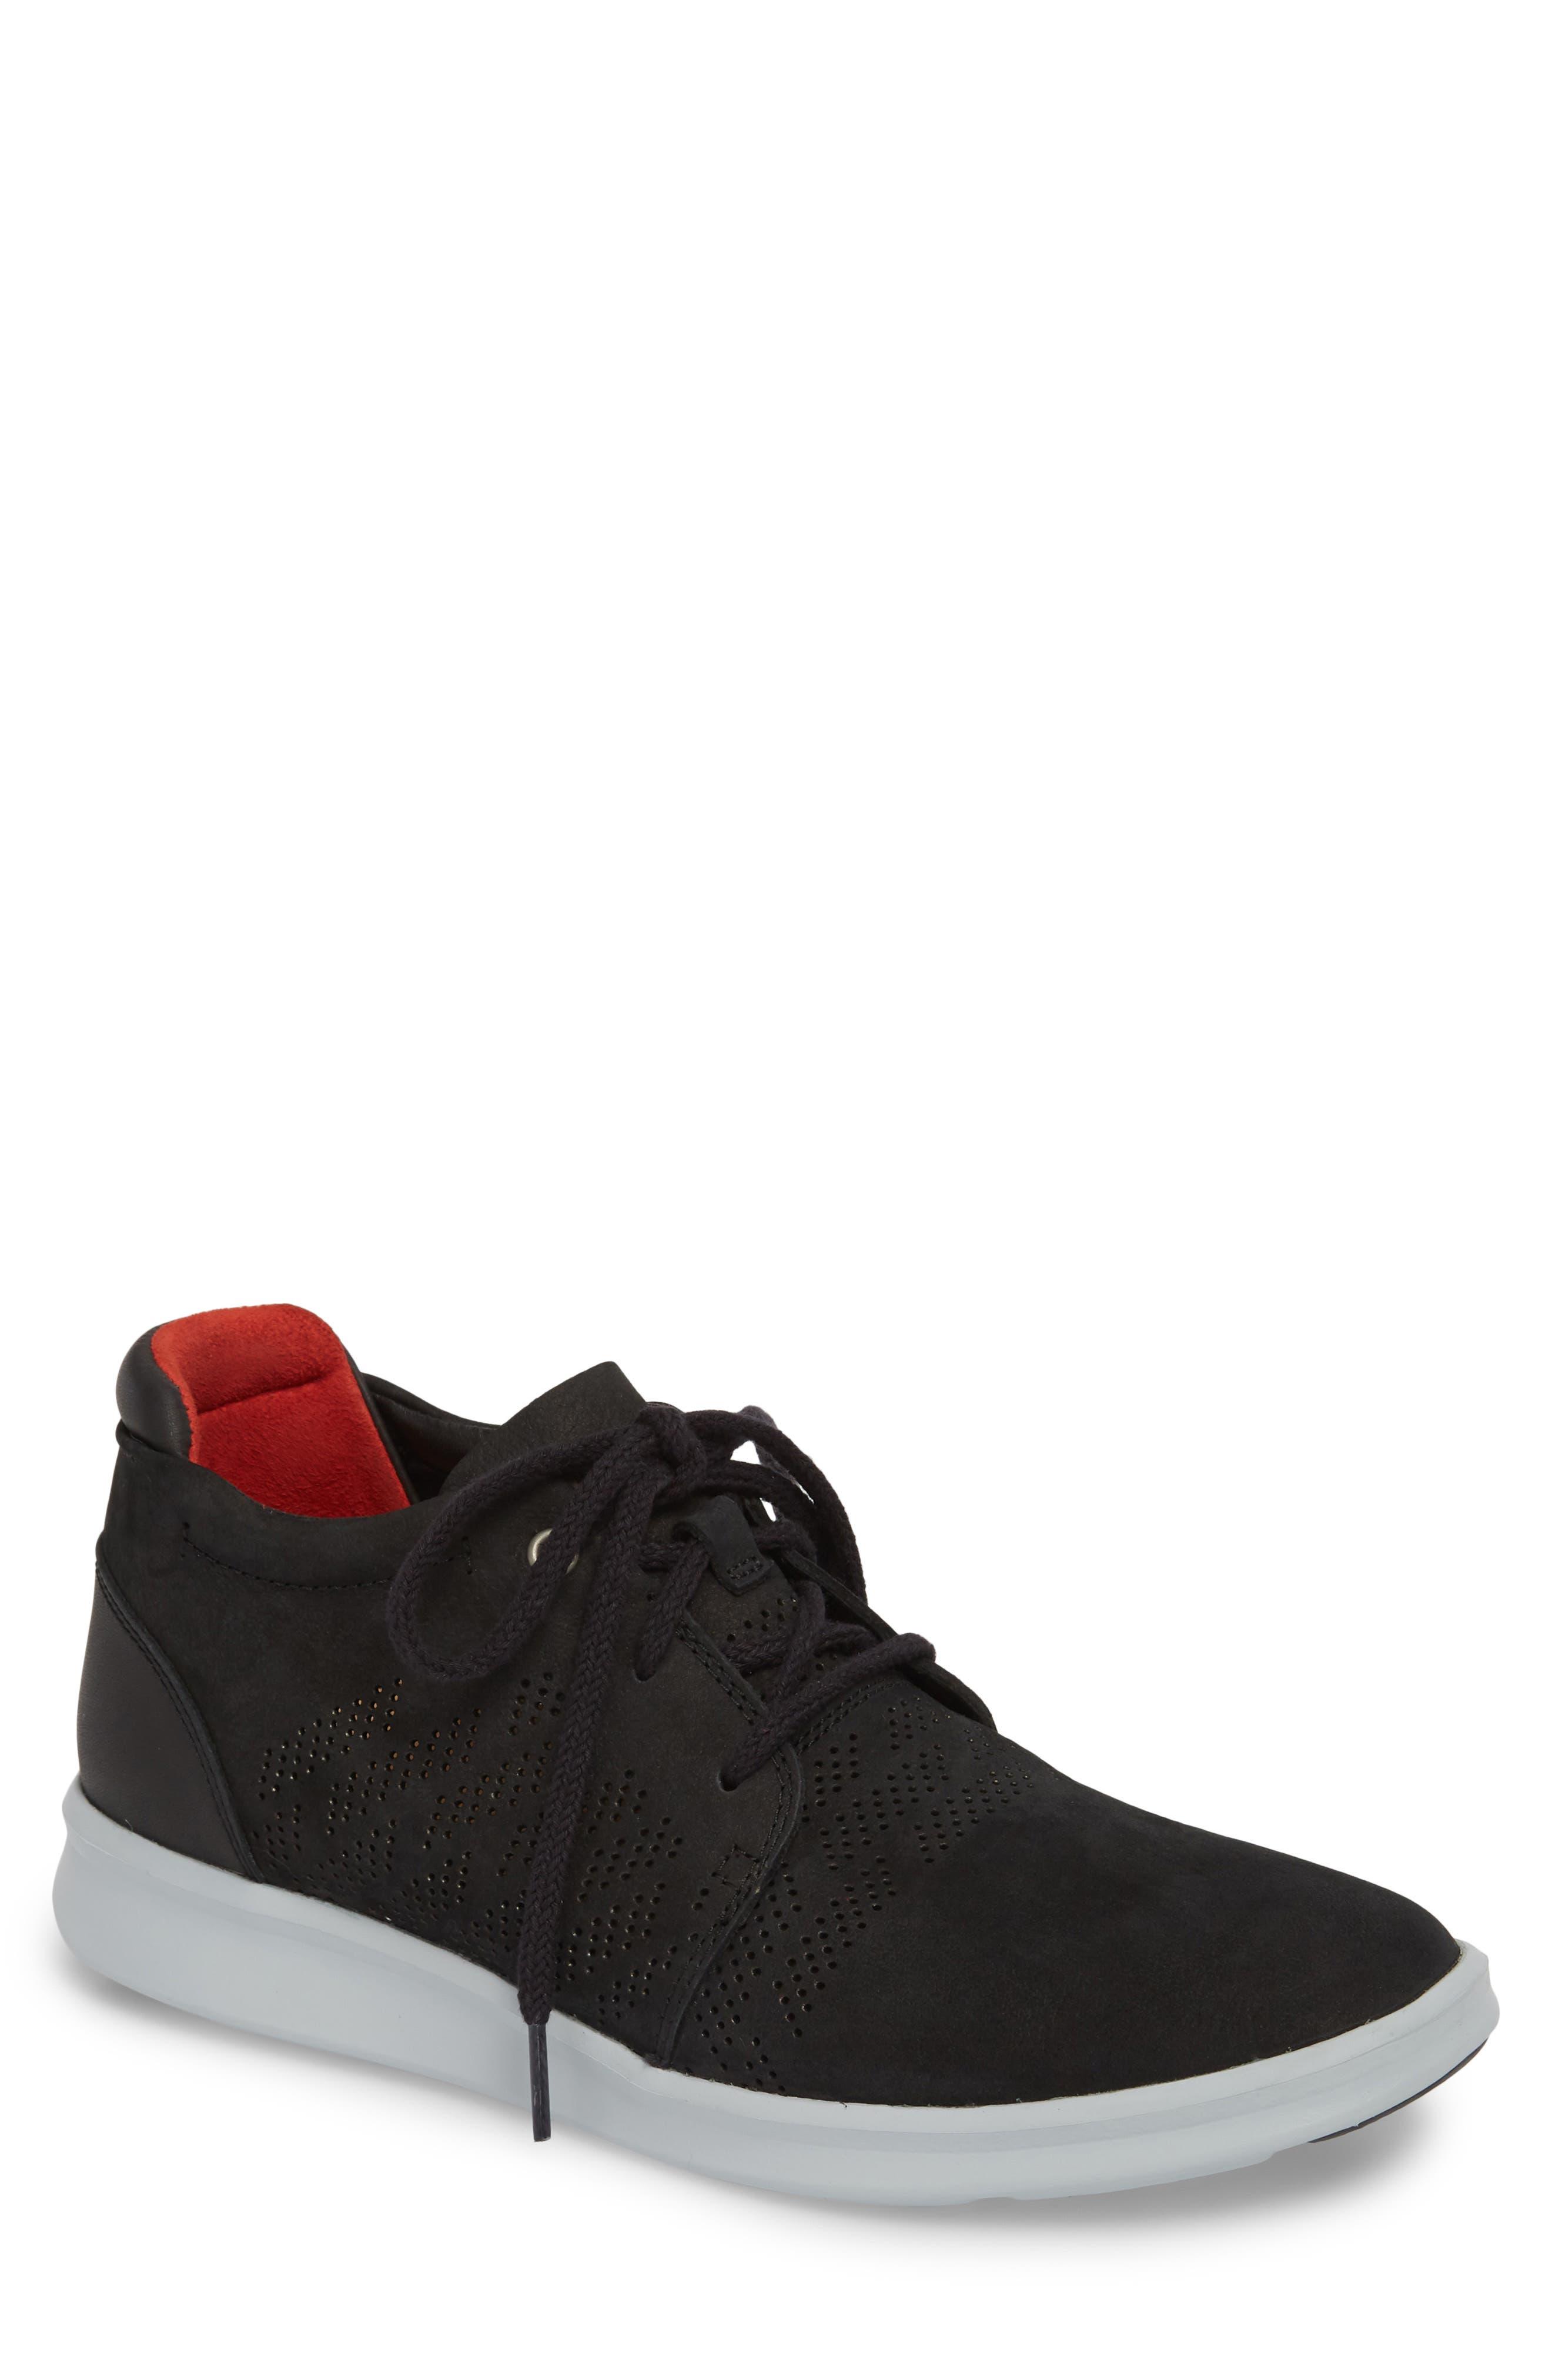 UGG<SUP>®</SUP> Larken Chukka Sneaker, Main, color, 001